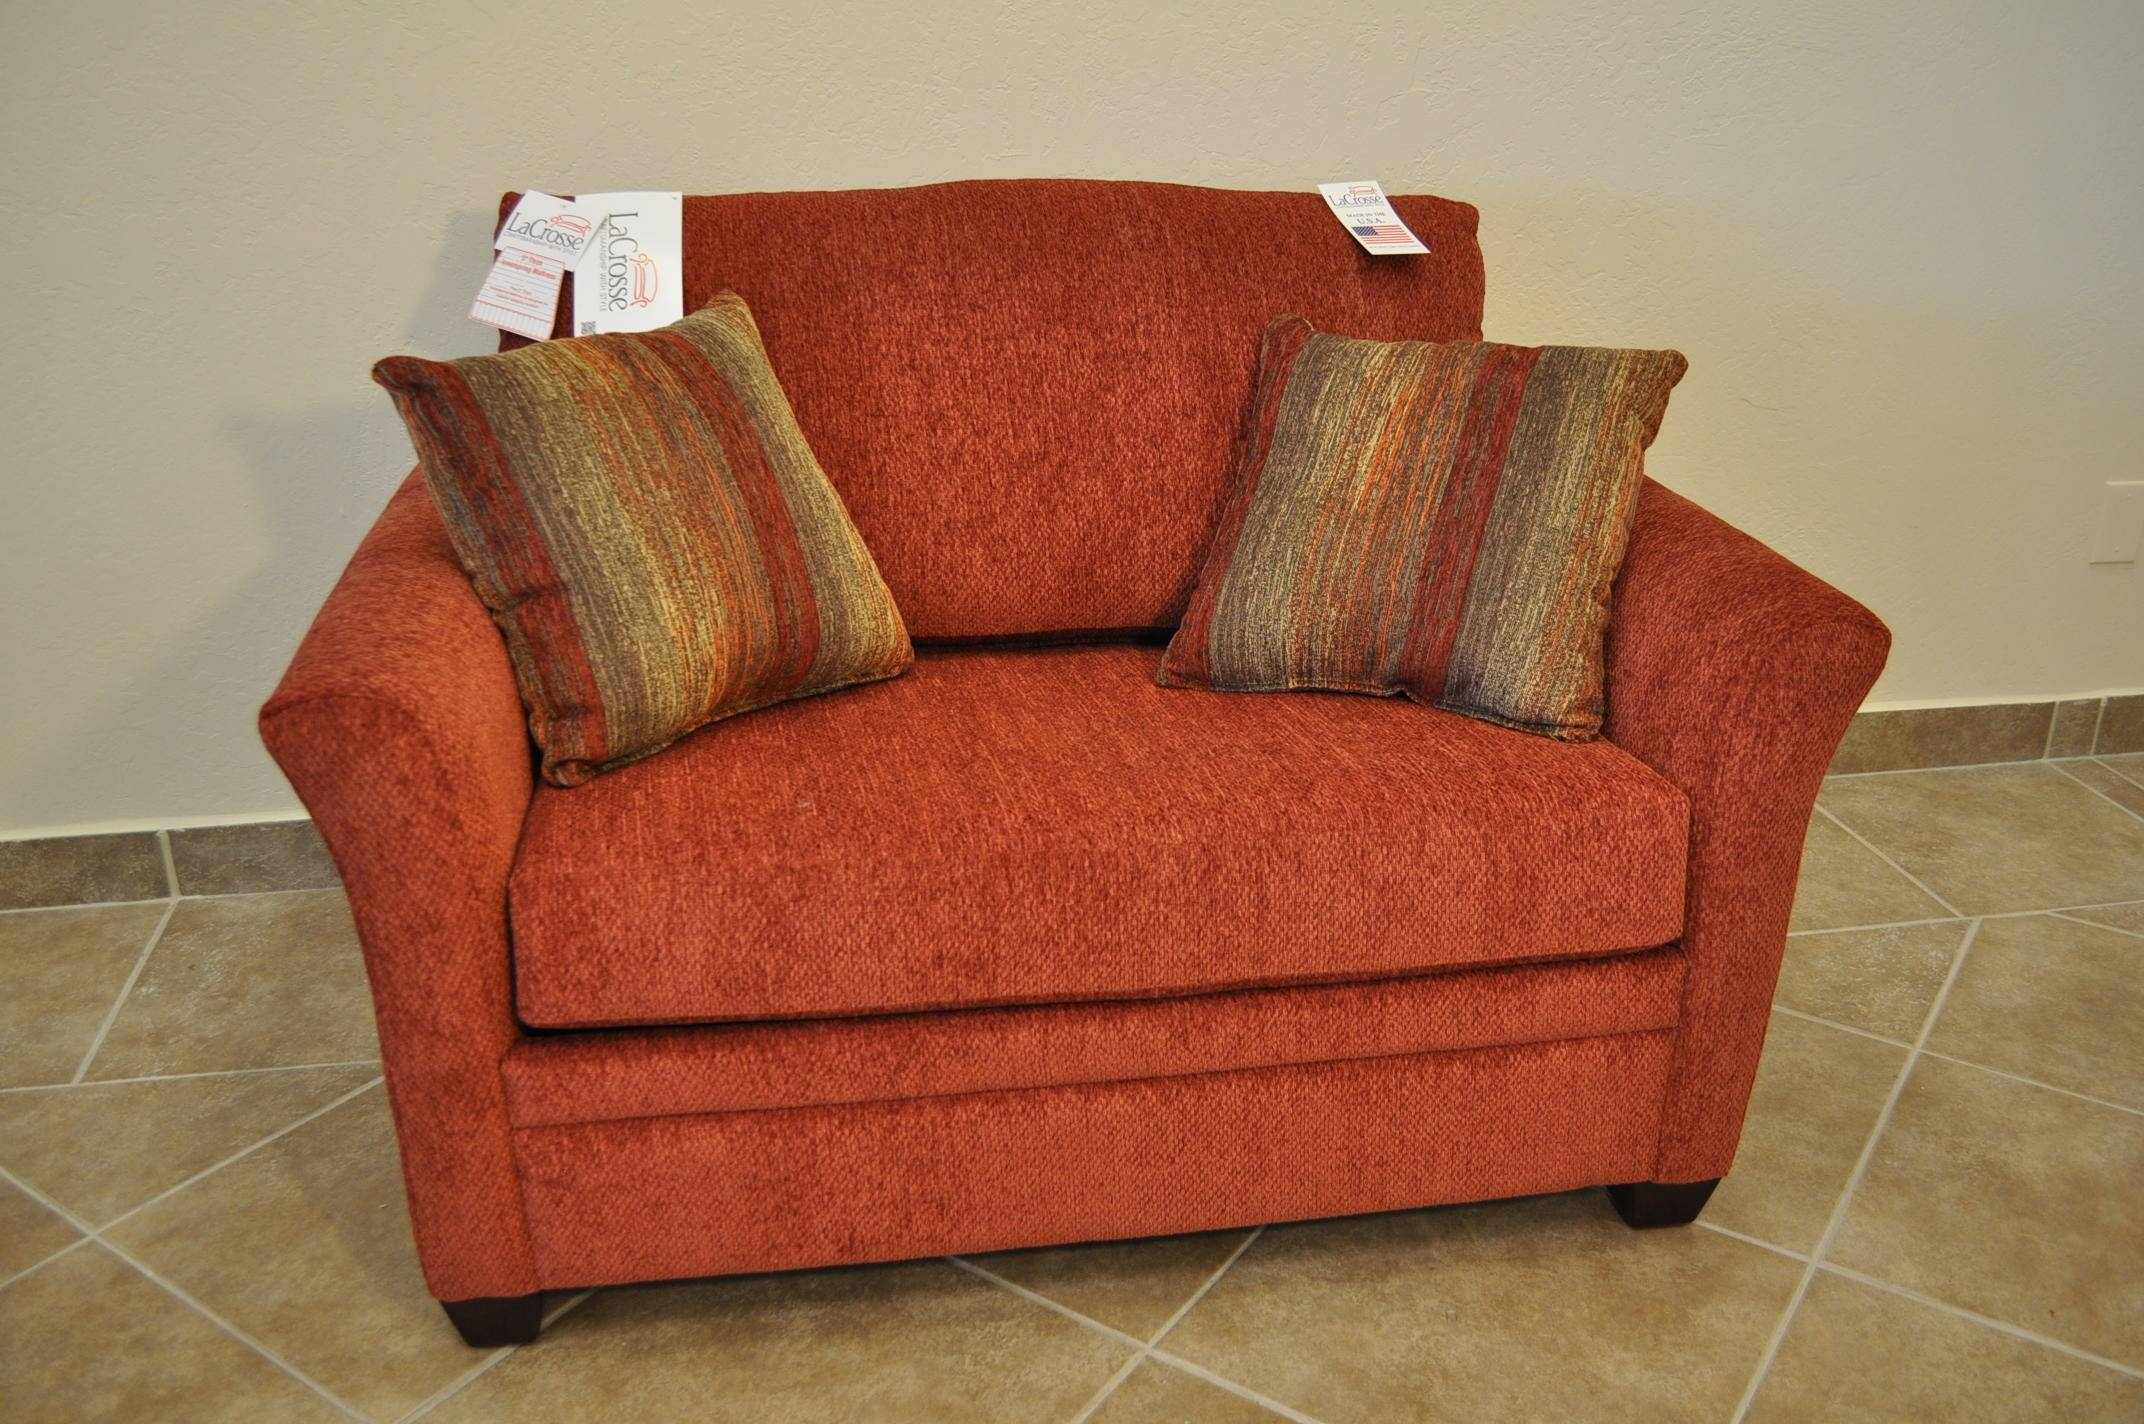 Furniture Home: Somerset Twin Sleeper Sofa Design Modern 2017 throughout Loveseat Twin Sleeper Sofas (Image 11 of 30)